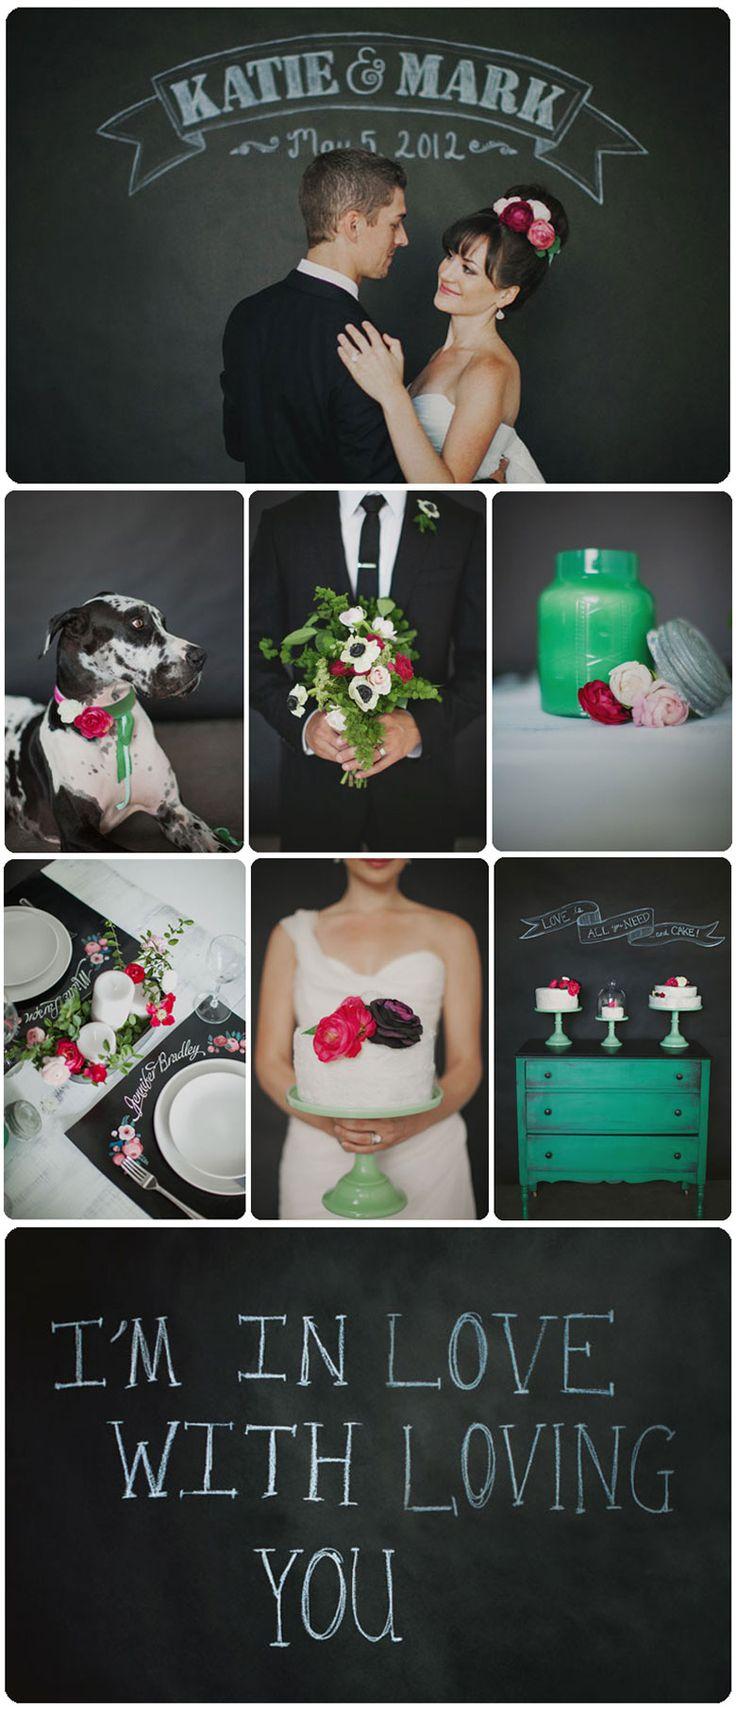 Chalkboard Wedding  placemats?  photos- groom w/ bouquet, bride w/ cake?